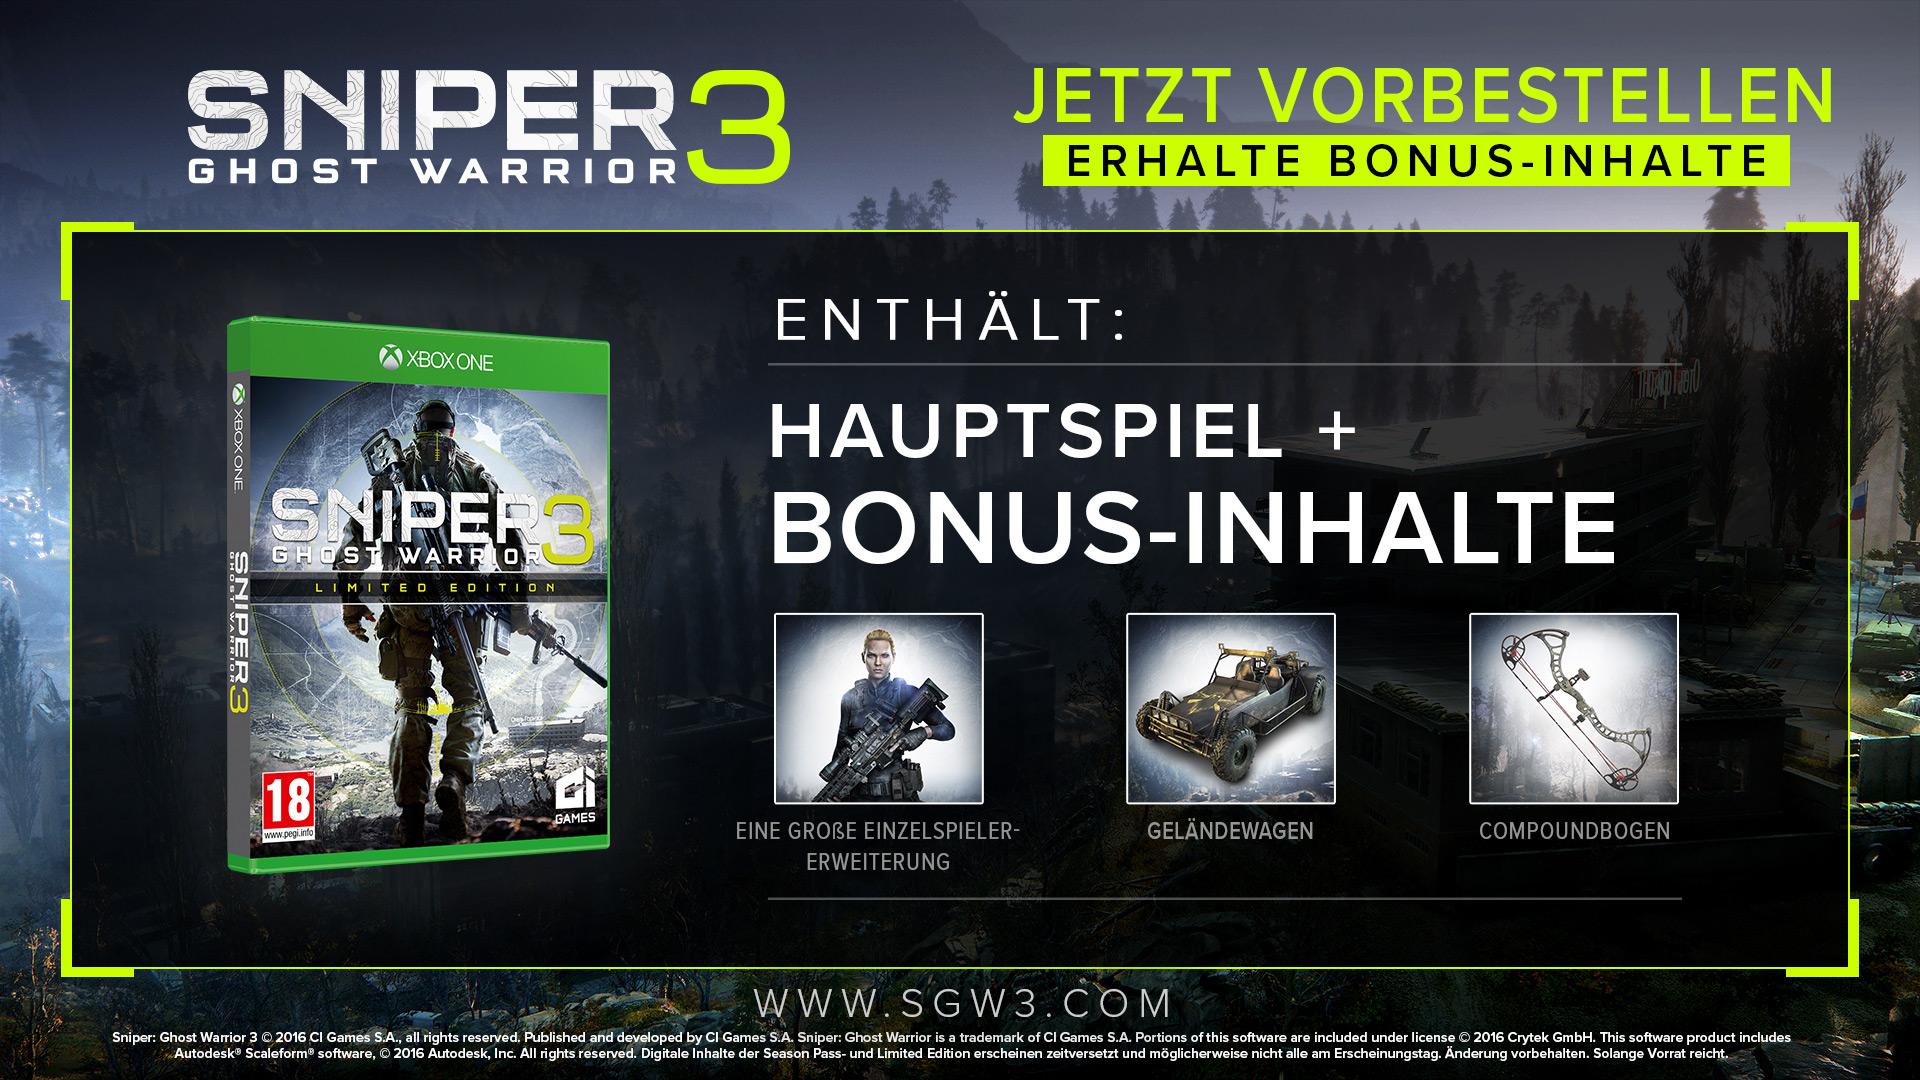 Sniper: Ghost Warrior 3 Message Board for PlayStation 4 - GameFAQs